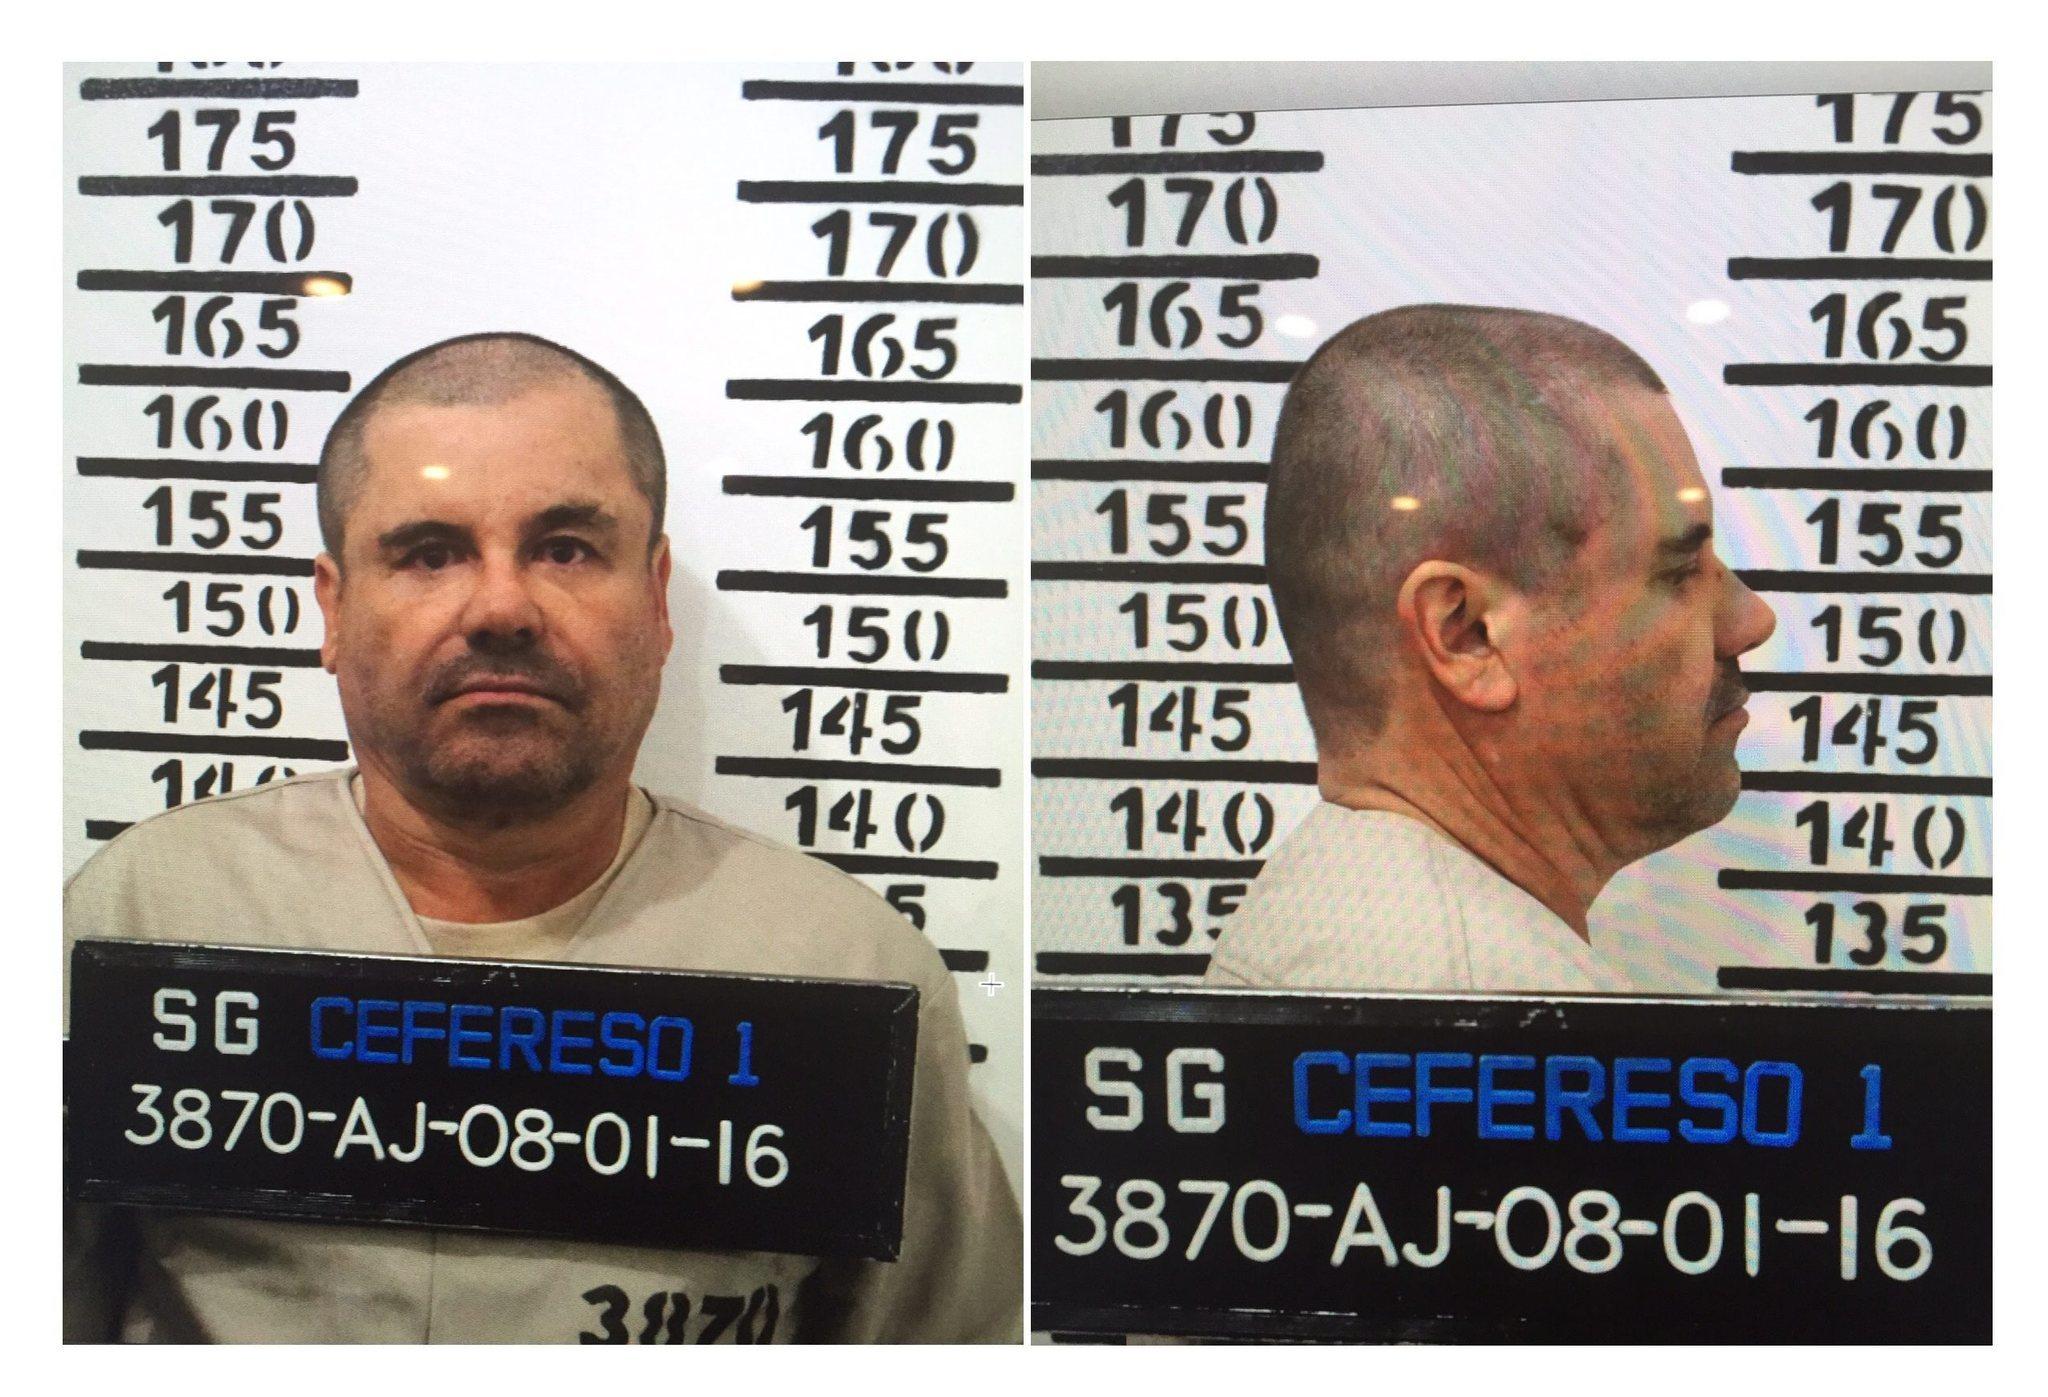 Drug lord 'El Chapo' recaptured, Mexican president says